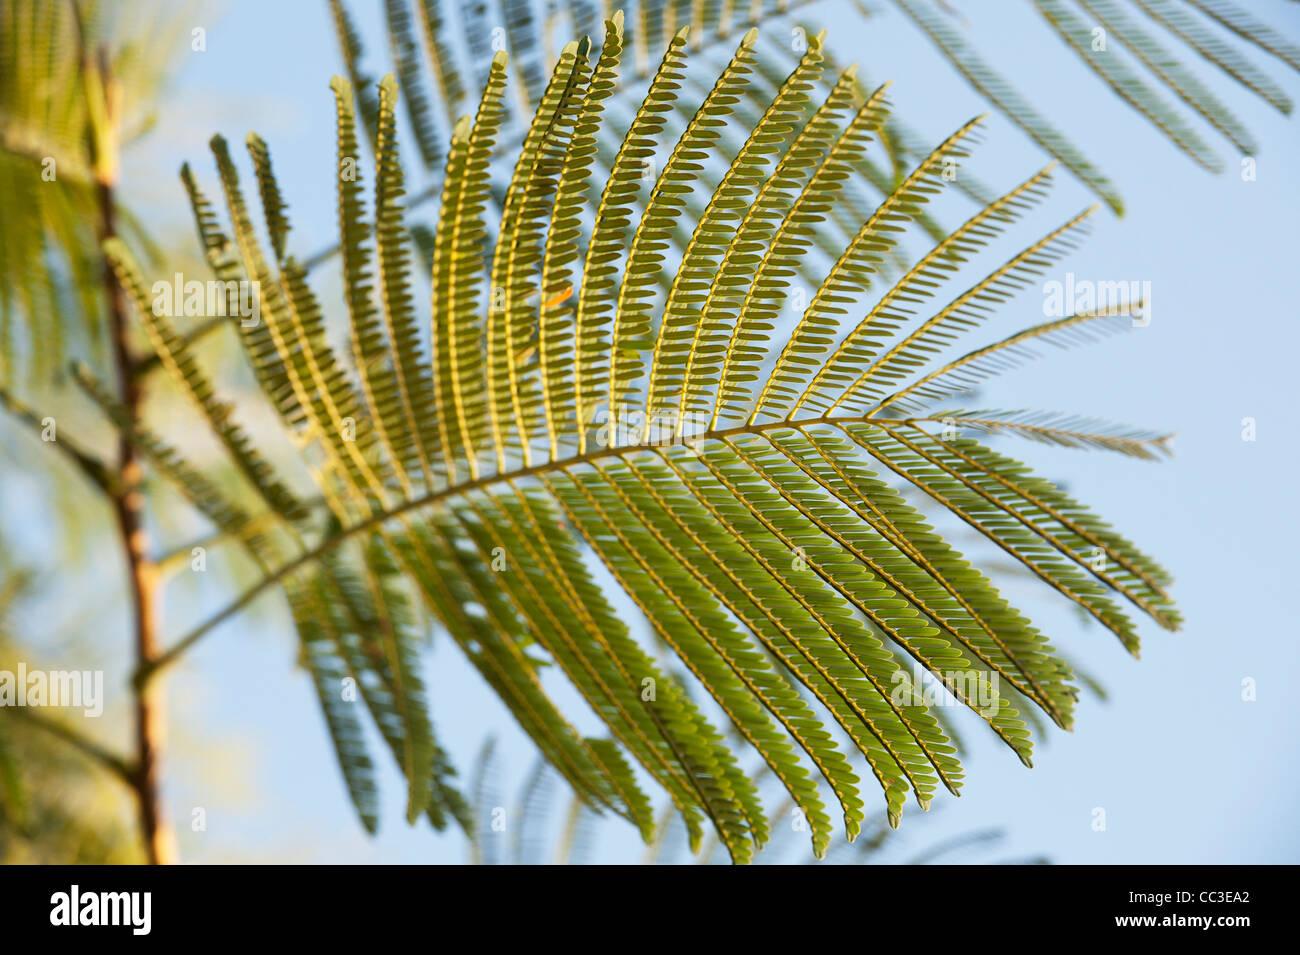 Albizia chinensis. Silktree leaf pattern. India - Stock Image